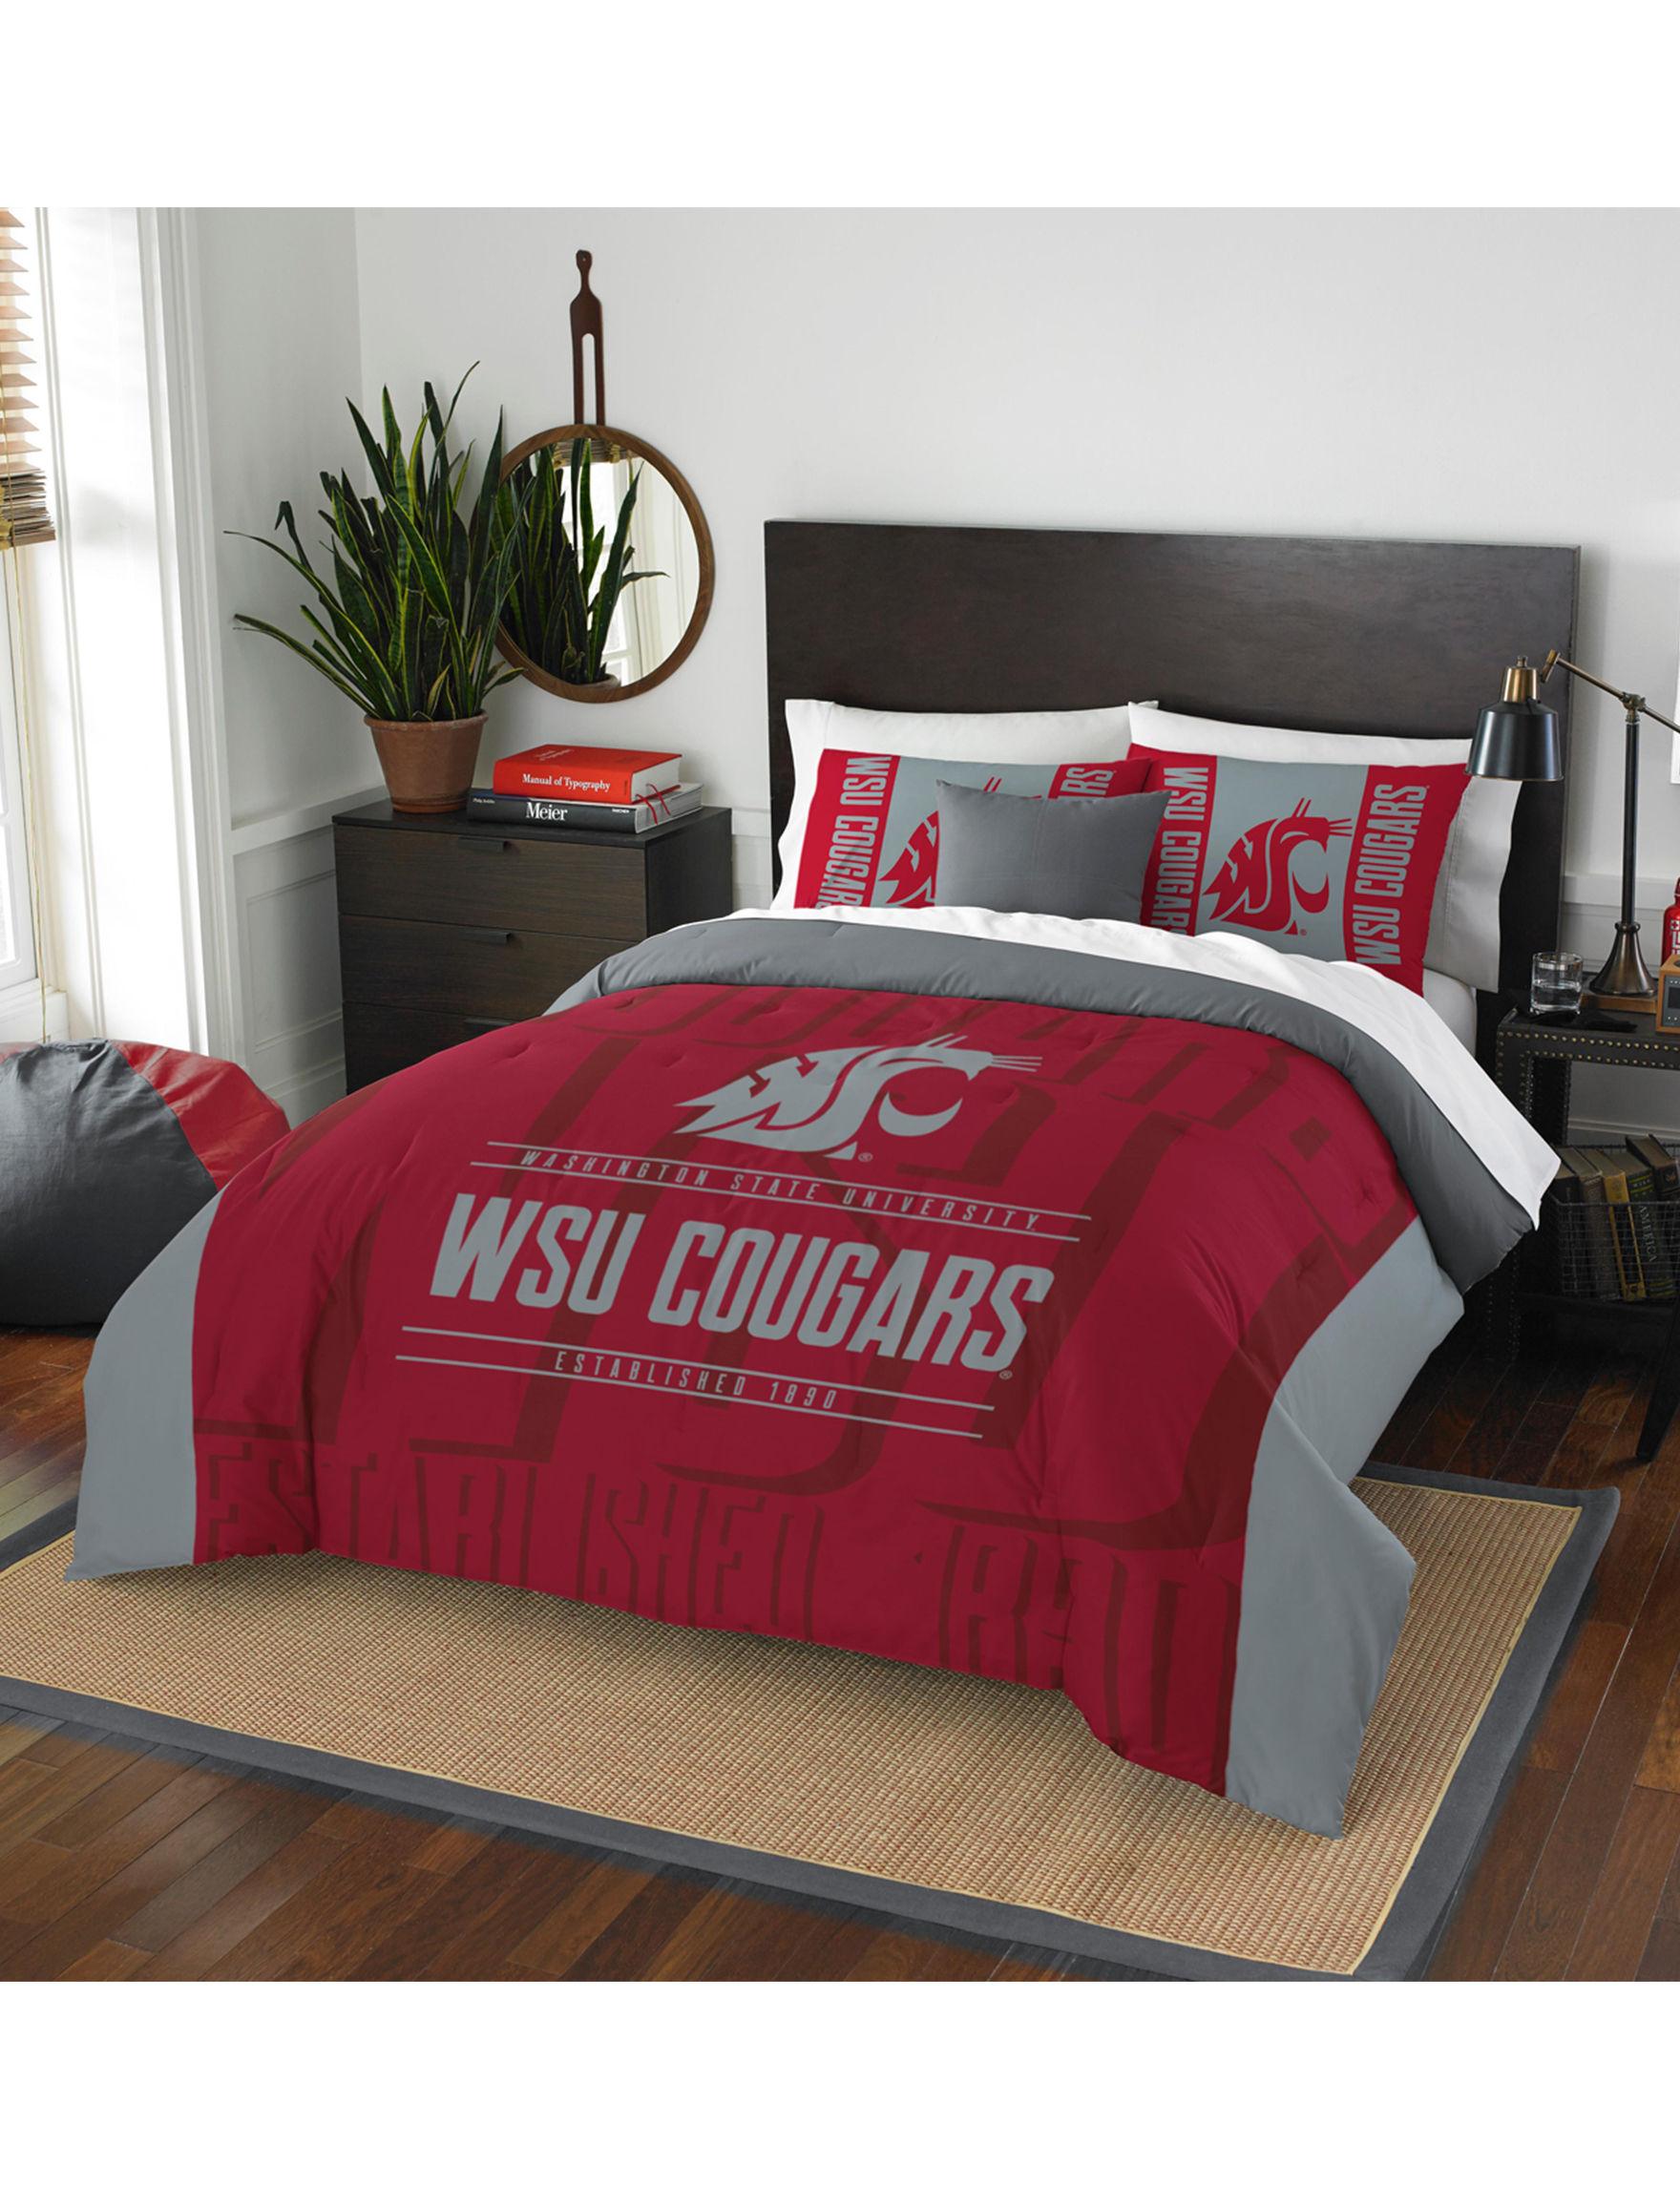 The Northwest Company Multi Comforters & Comforter Sets